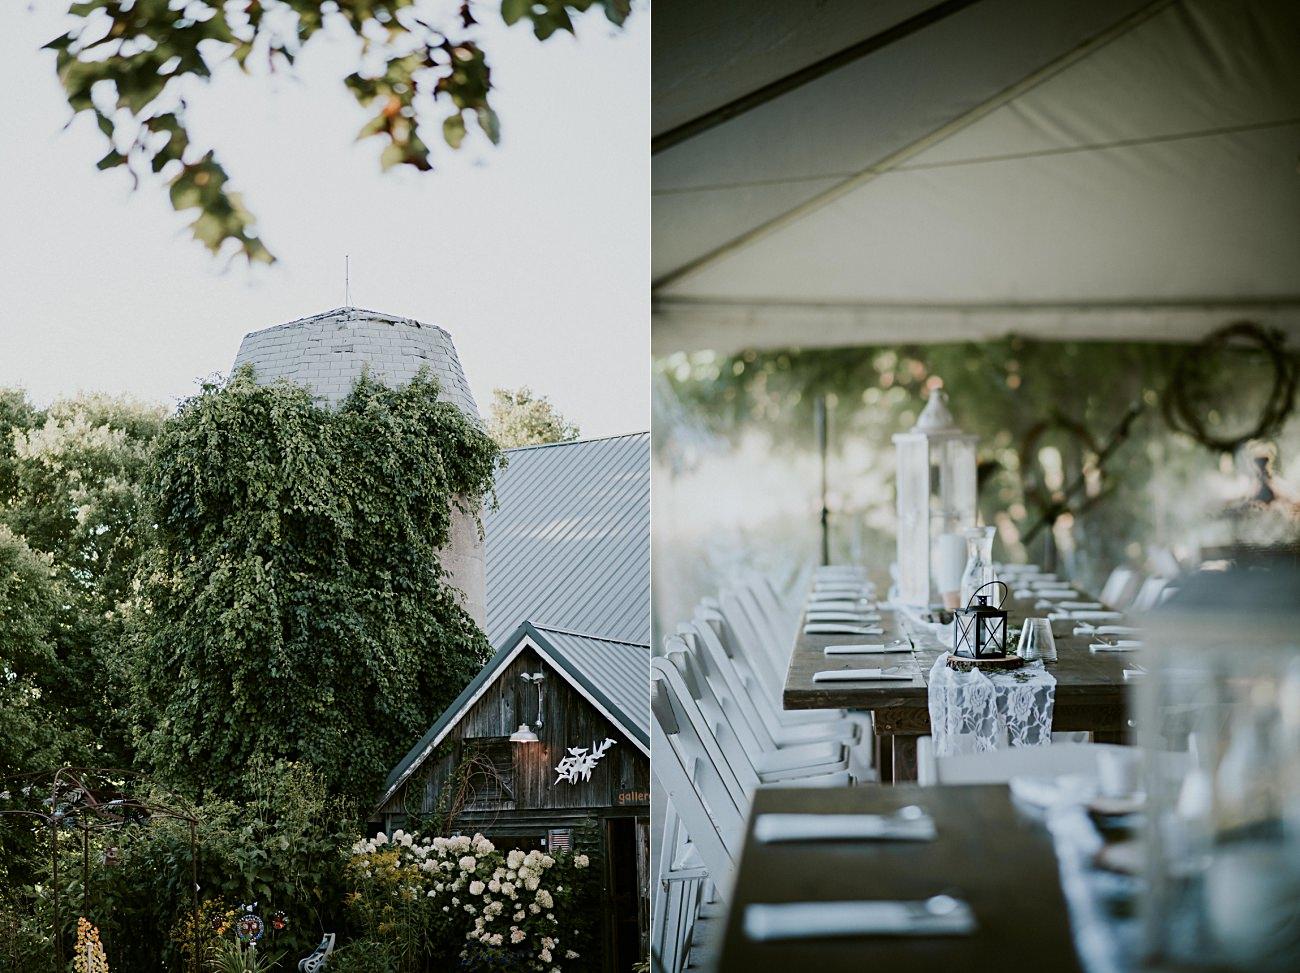 Barn Wedding - Wedding Party Photos - Door County Wedding